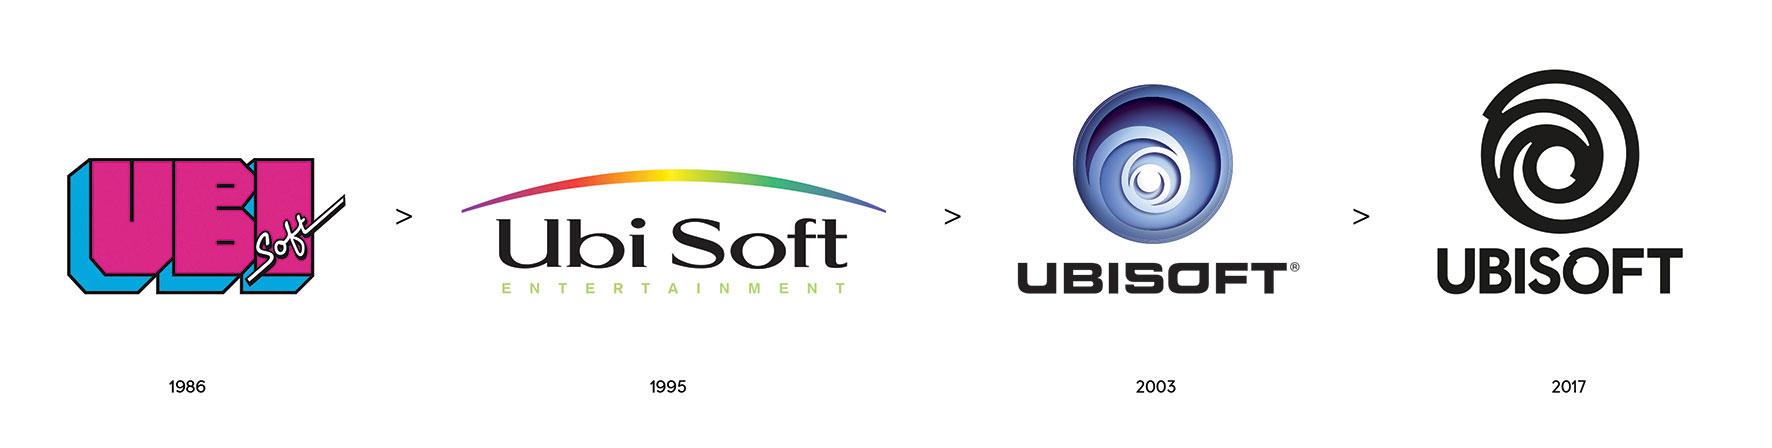 evolution of Ubisoft logos